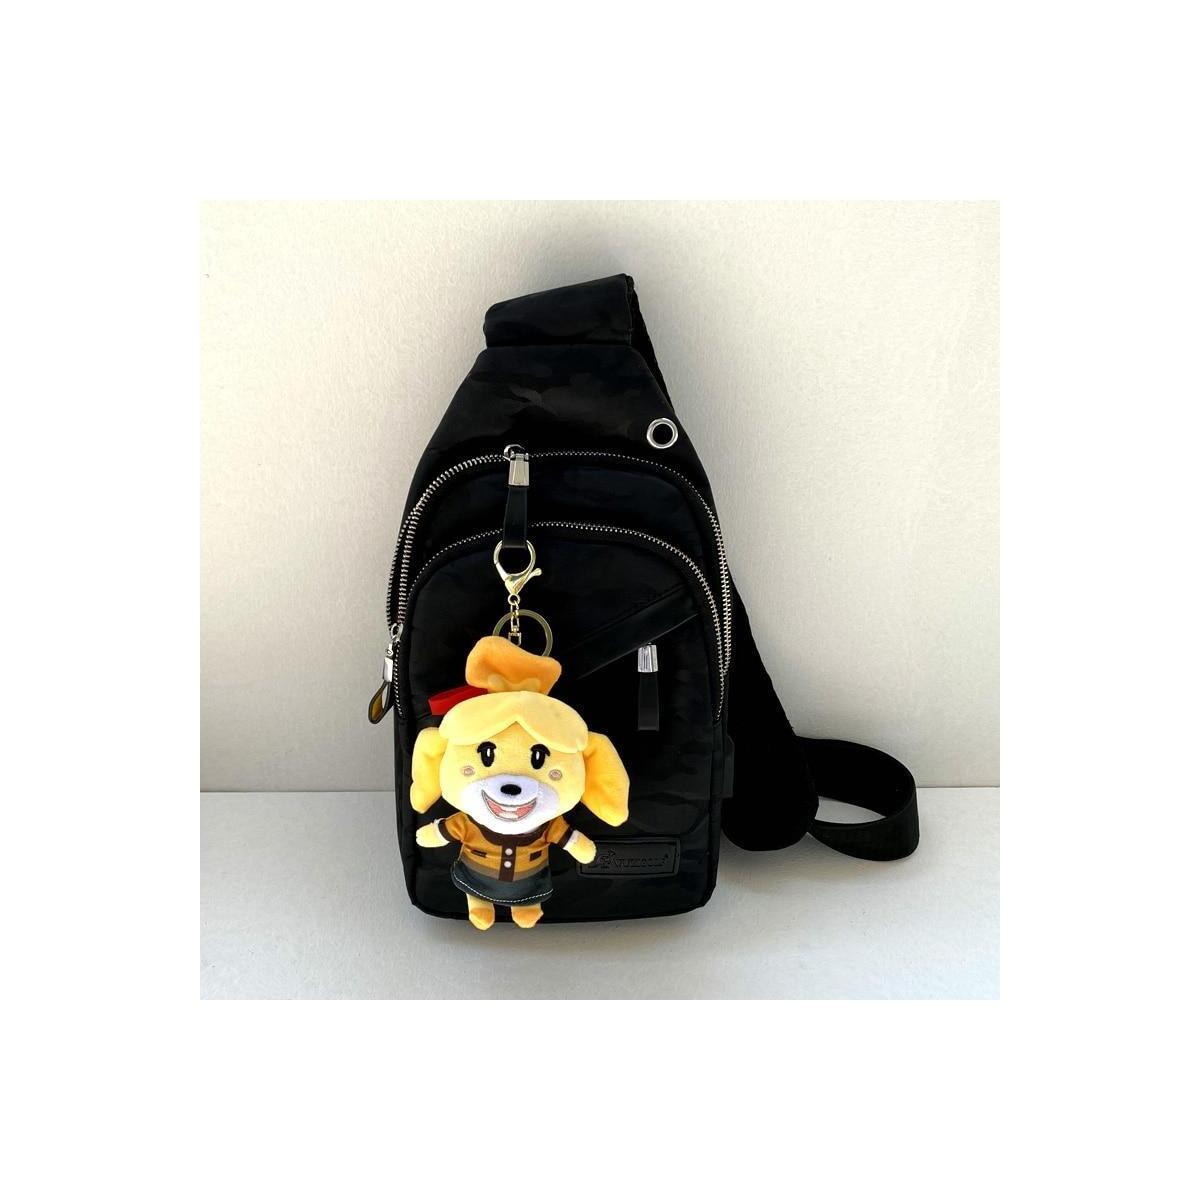 Animal Crossing Plush Villager Keychains, 12cm-fauna